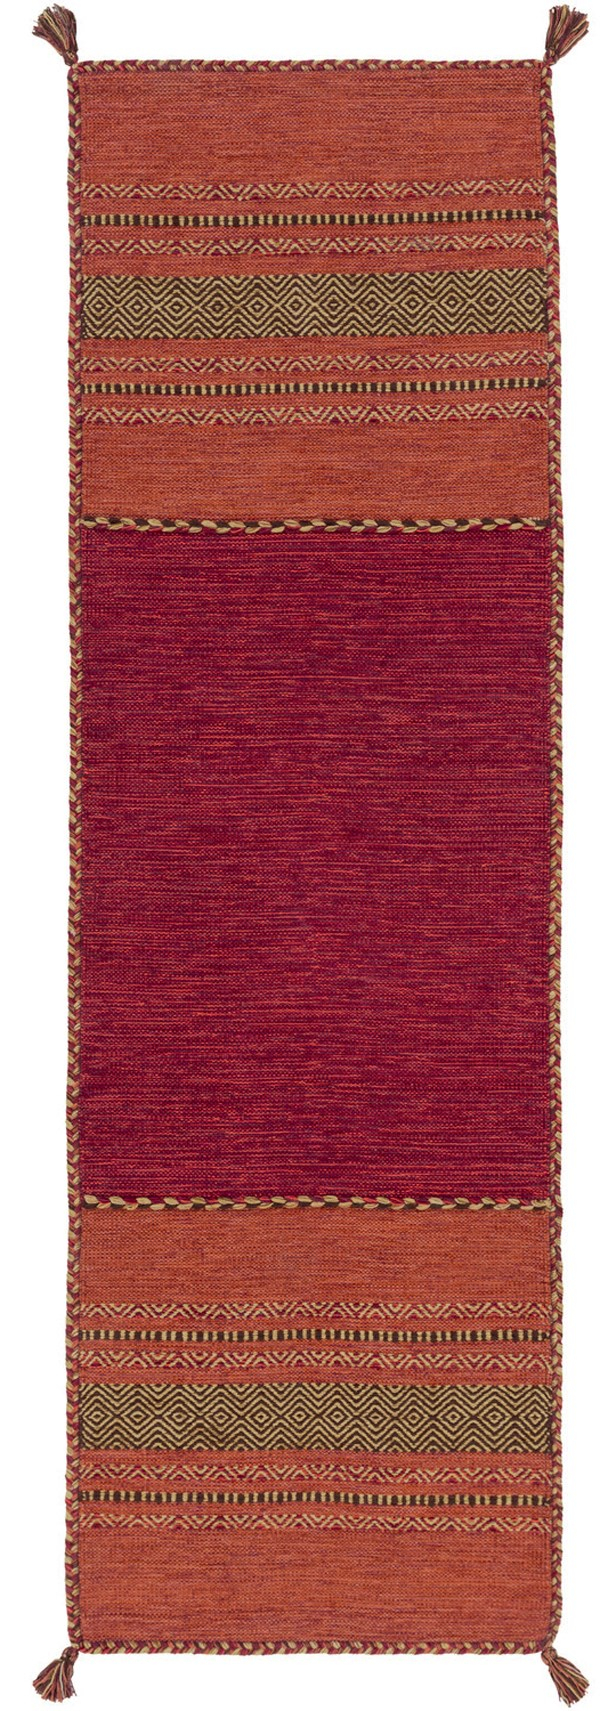 Rust, Chocolate, Cherry, Gold (TRZ-3002) Southwestern / Lodge Area Rug